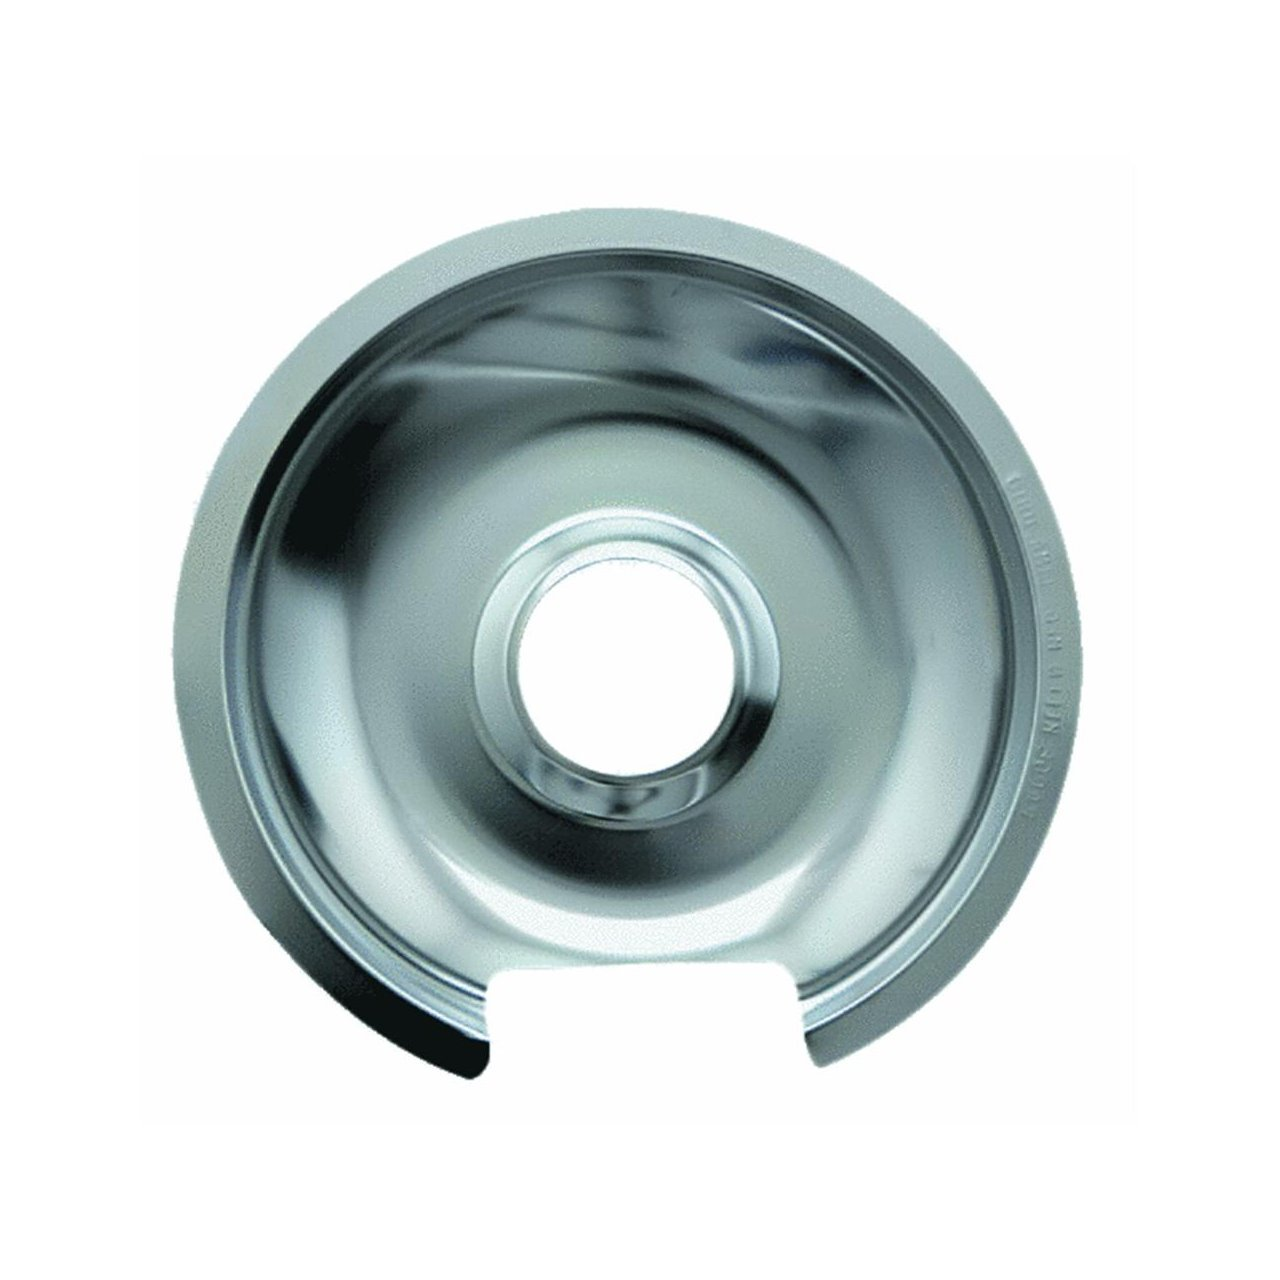 Range Kleen Chrome GE, Hotpoint, & Kenmore Reflector Drip Pan - 1 Each